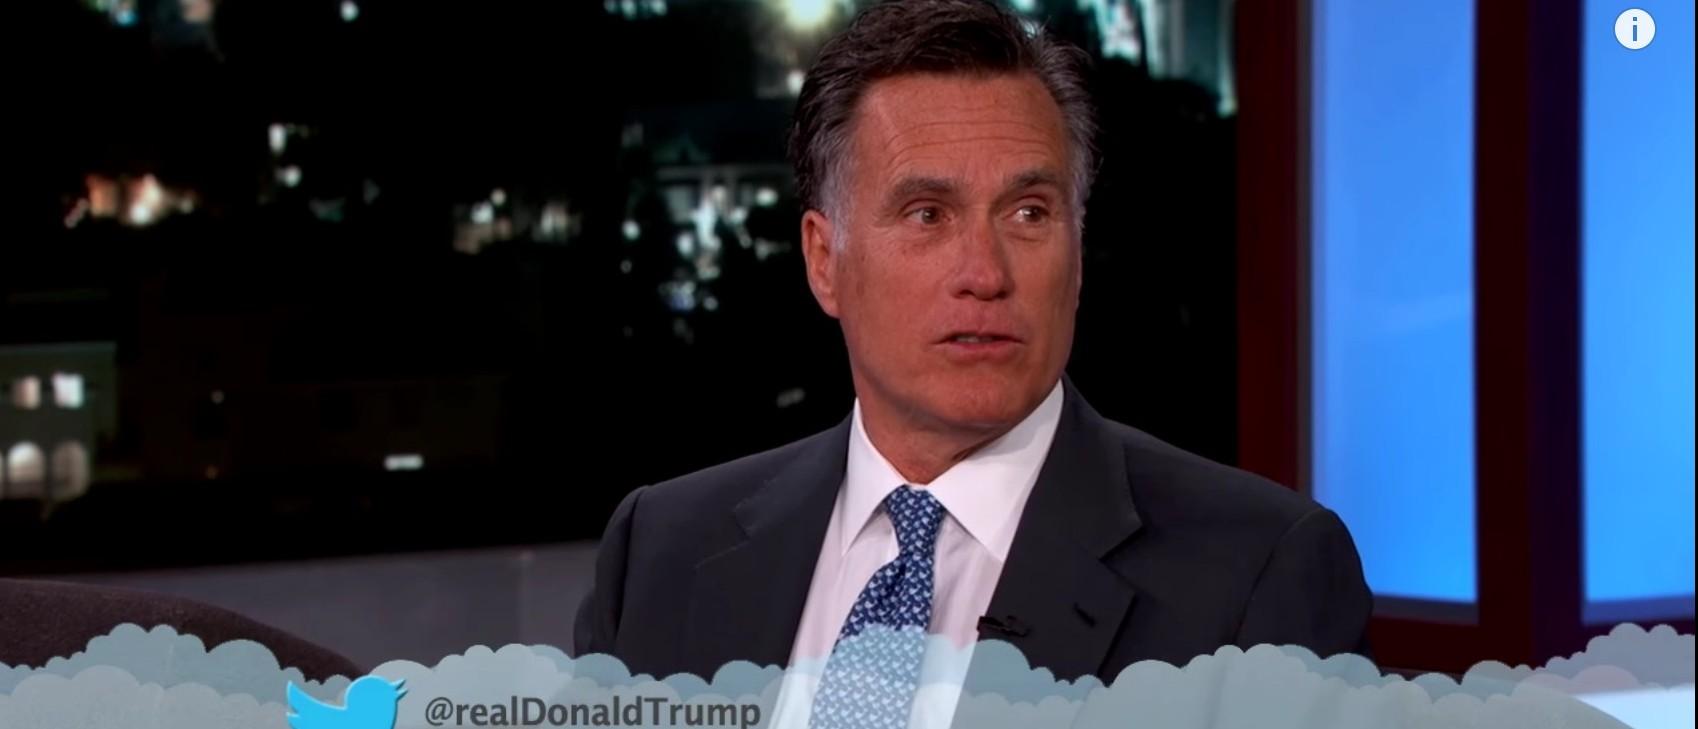 Mitt Romney, Screen Shot Jimmy Kimmel YouTube, 3-9-2016